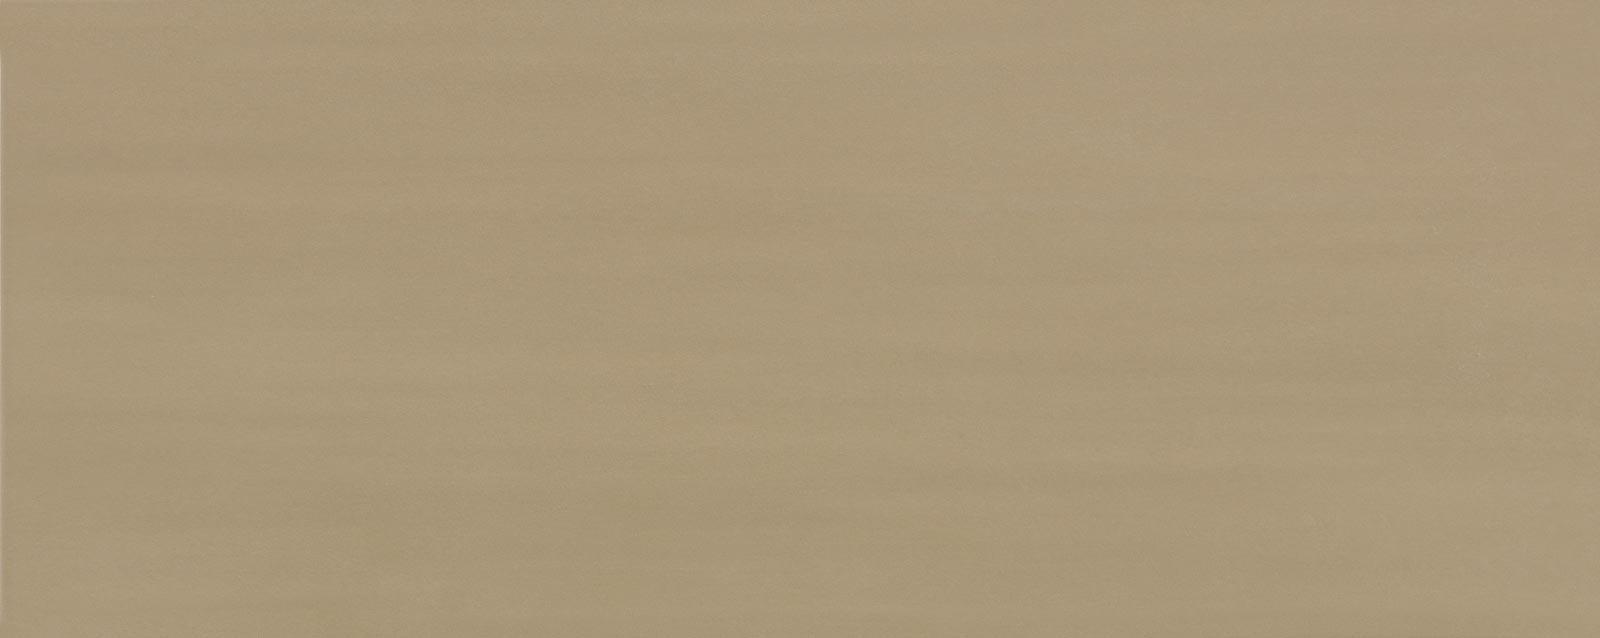 Плитка настенная Ragno Land Sand 20×50 R4Cz